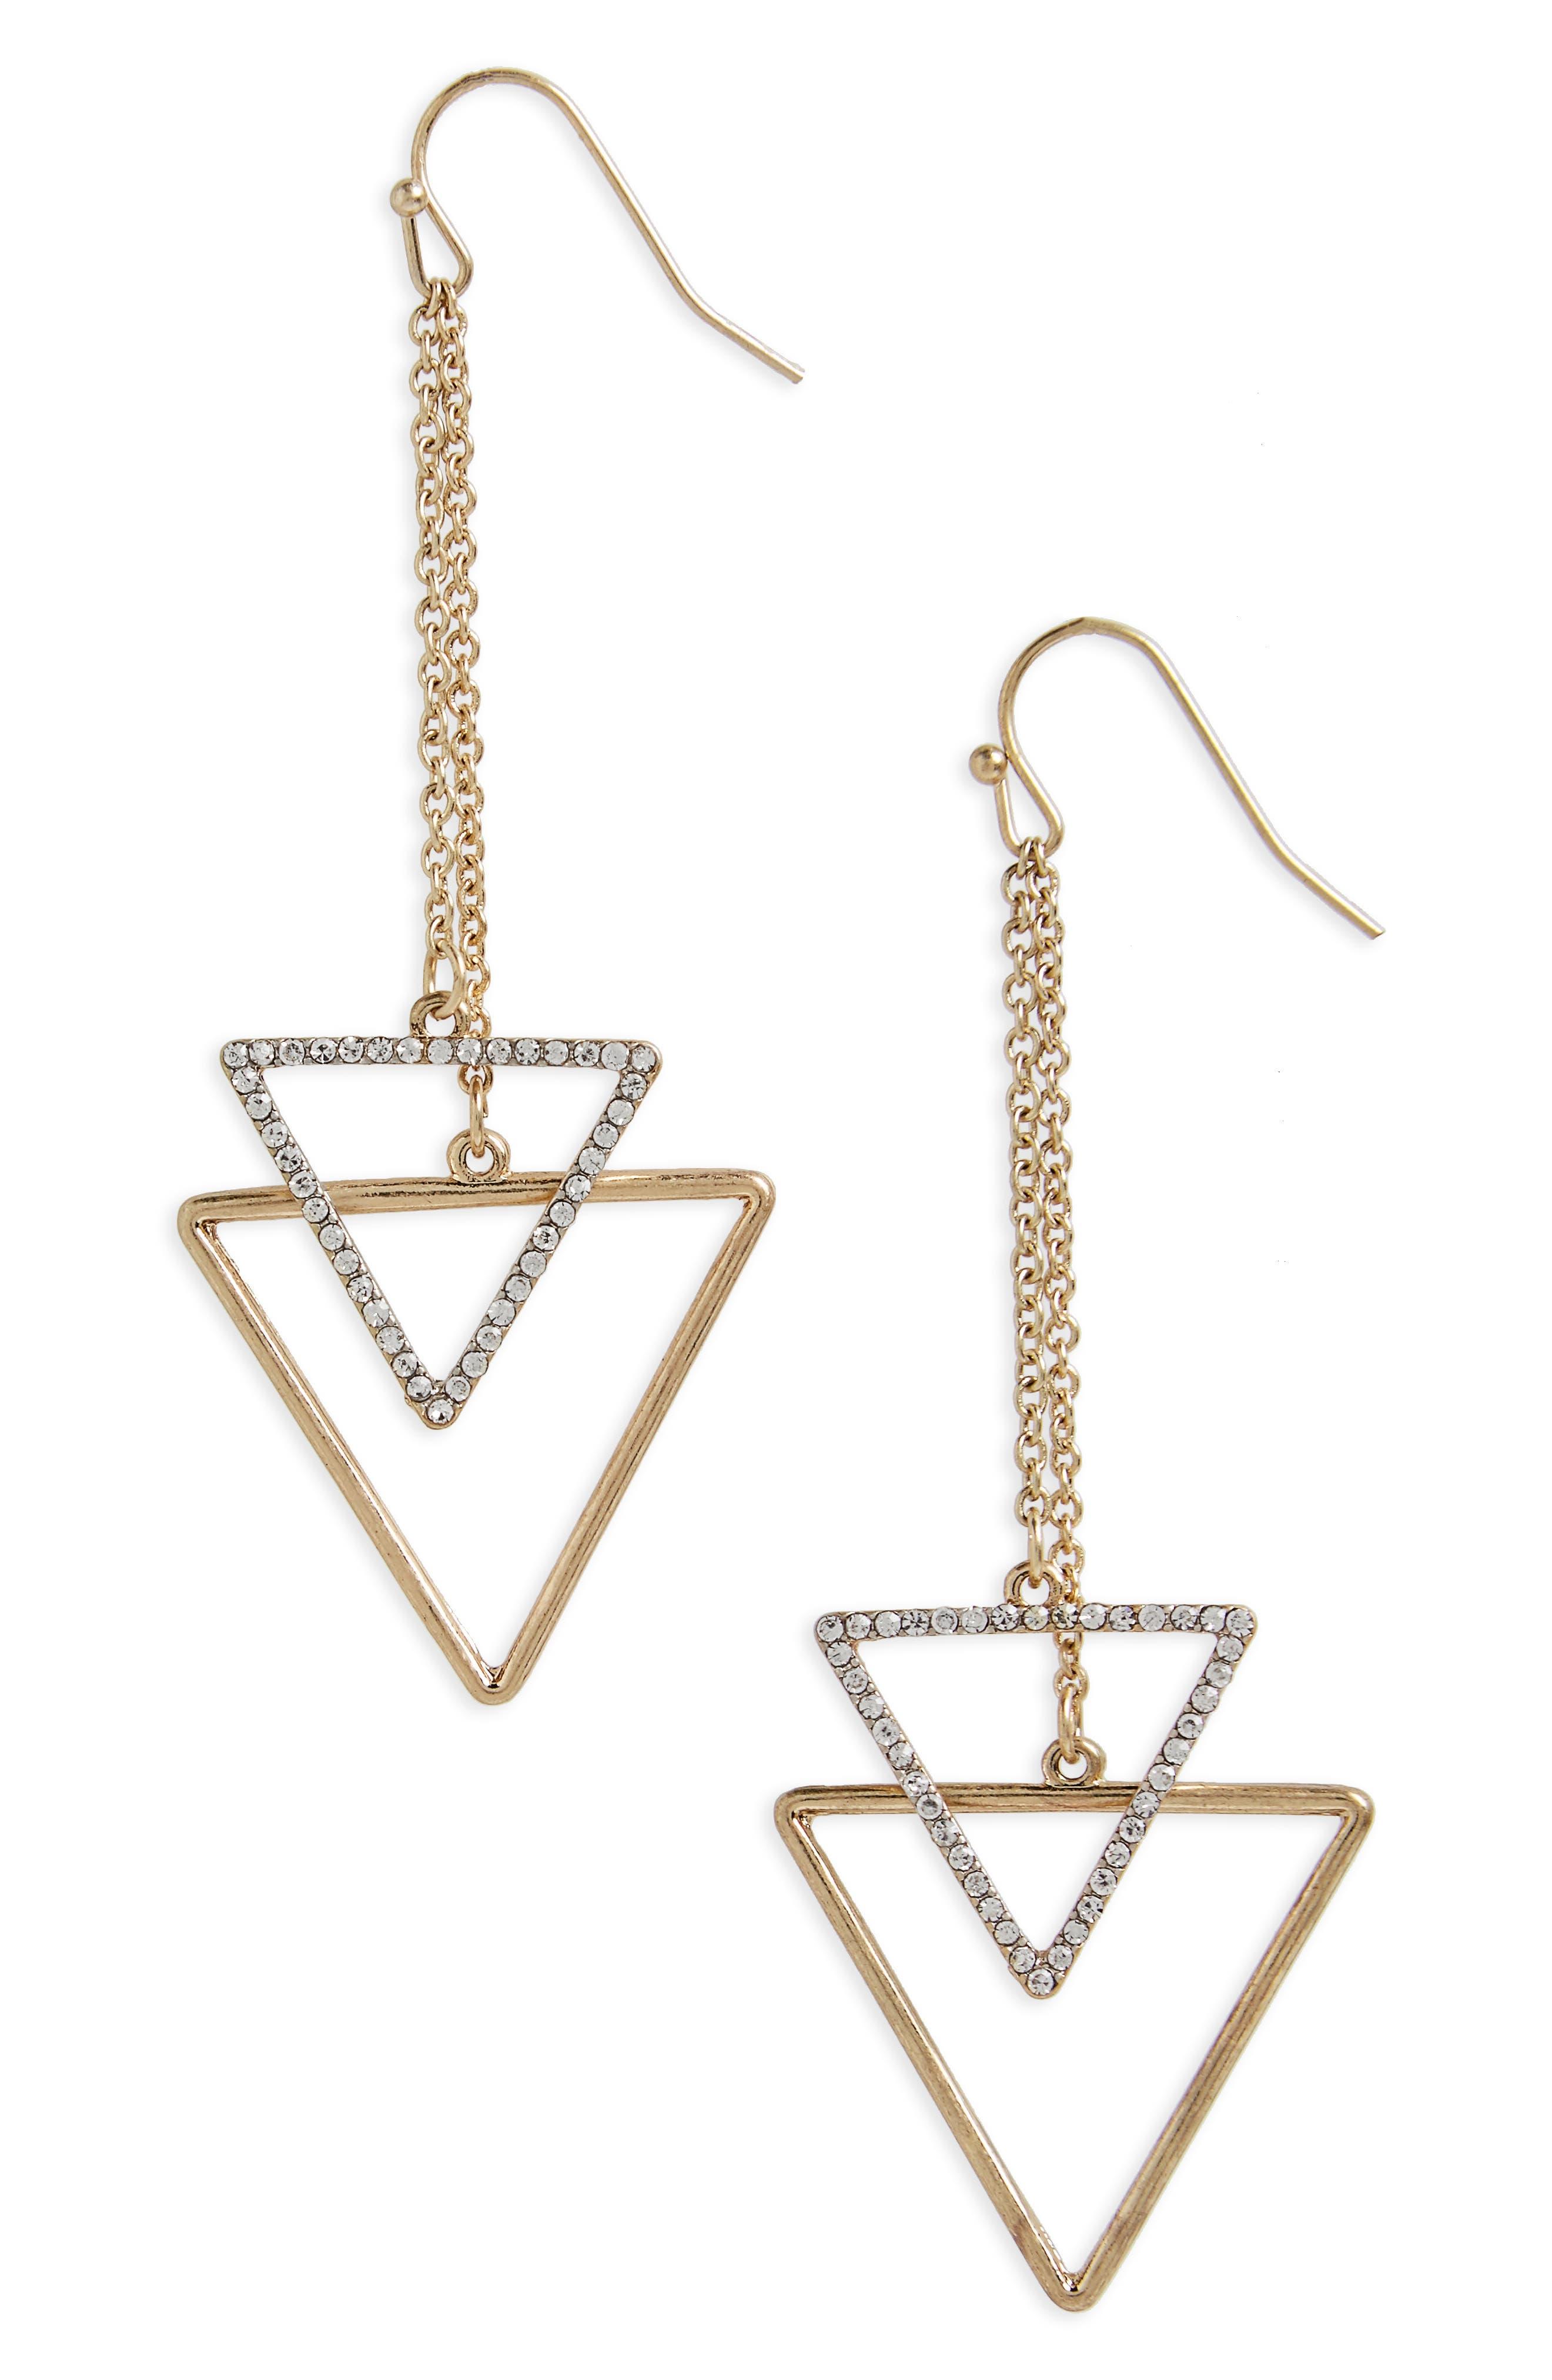 Chain Drop Triangle Earrings,                             Main thumbnail 1, color,                             710